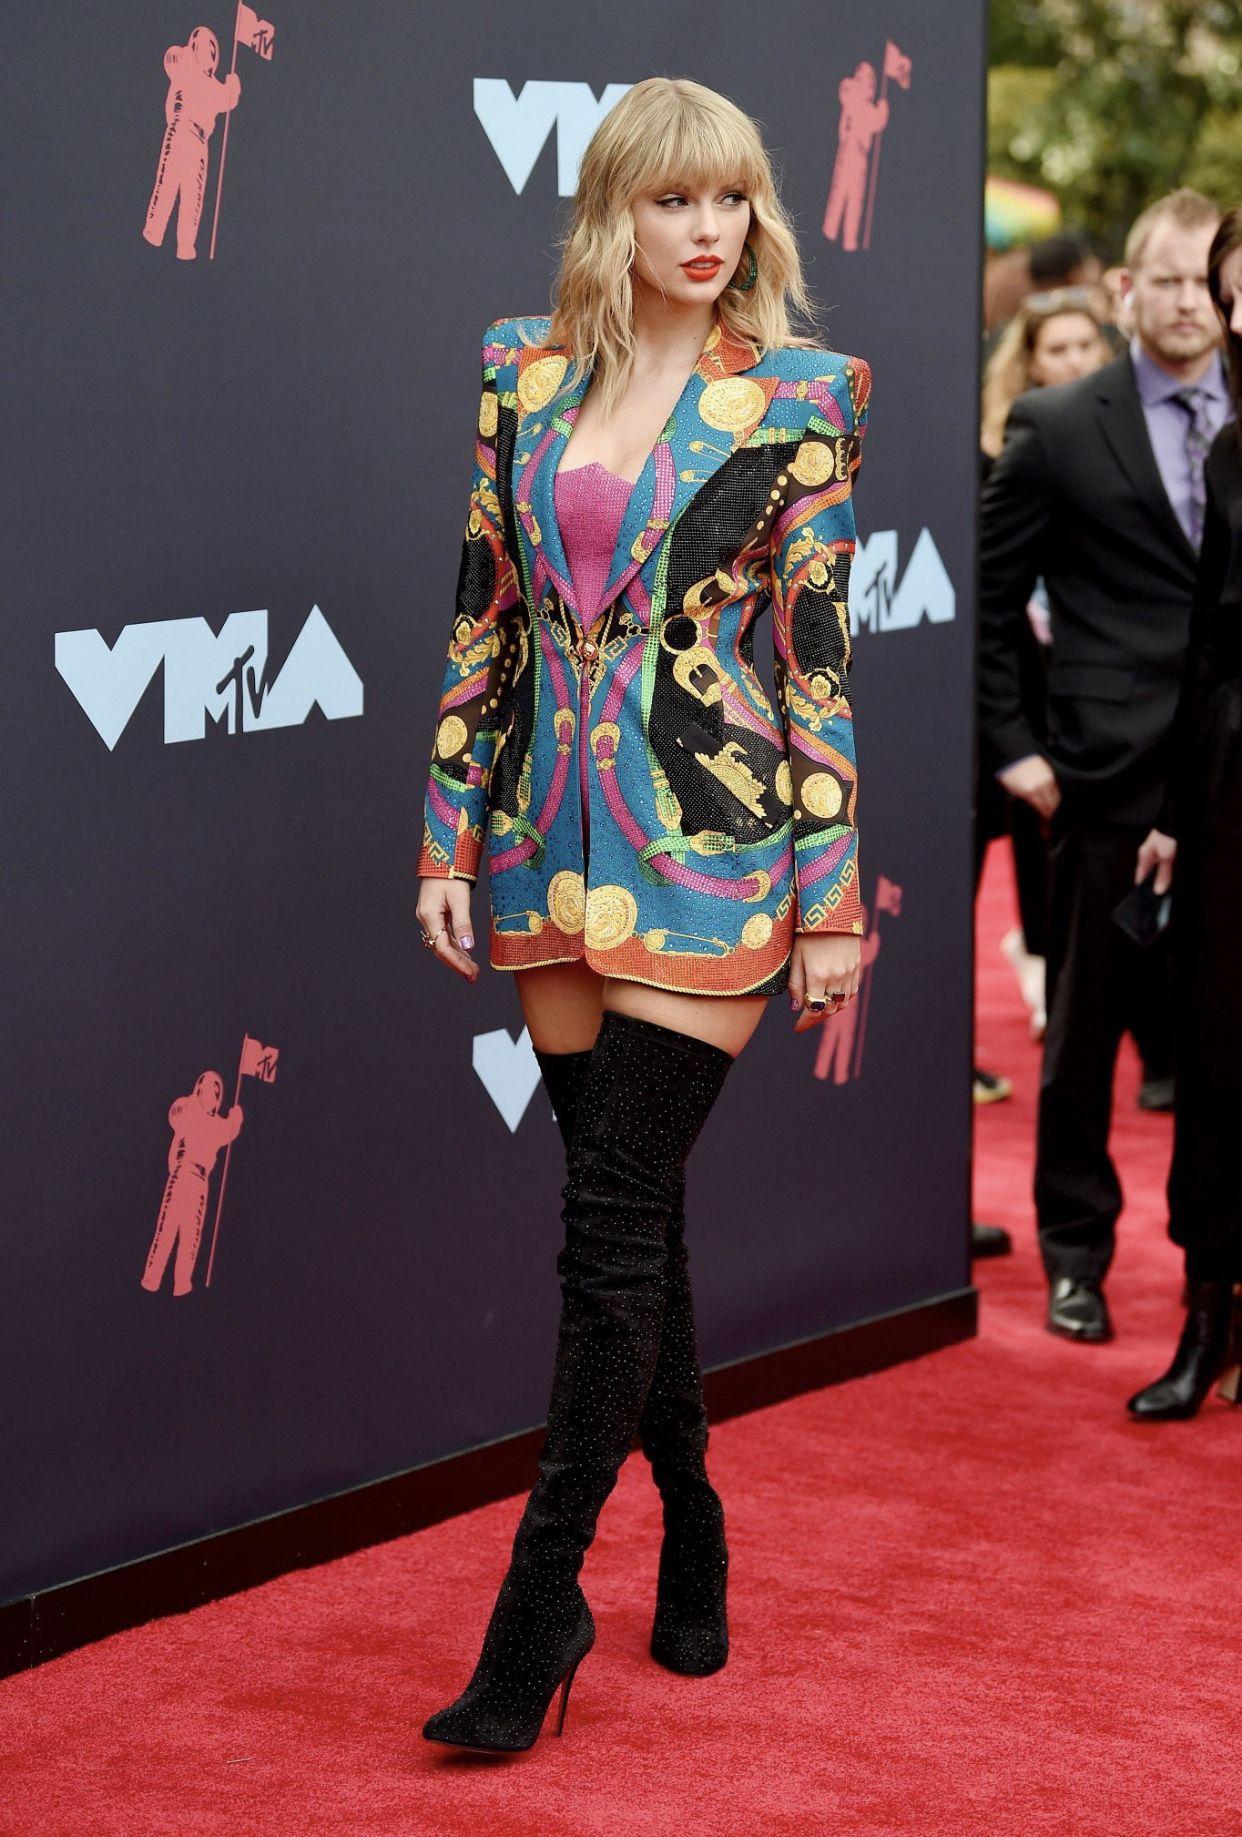 Pin By Syafiqah Rahim On Burton To This Taylor Taylor Outfits Taylor Swift Style Taylor Swift Red